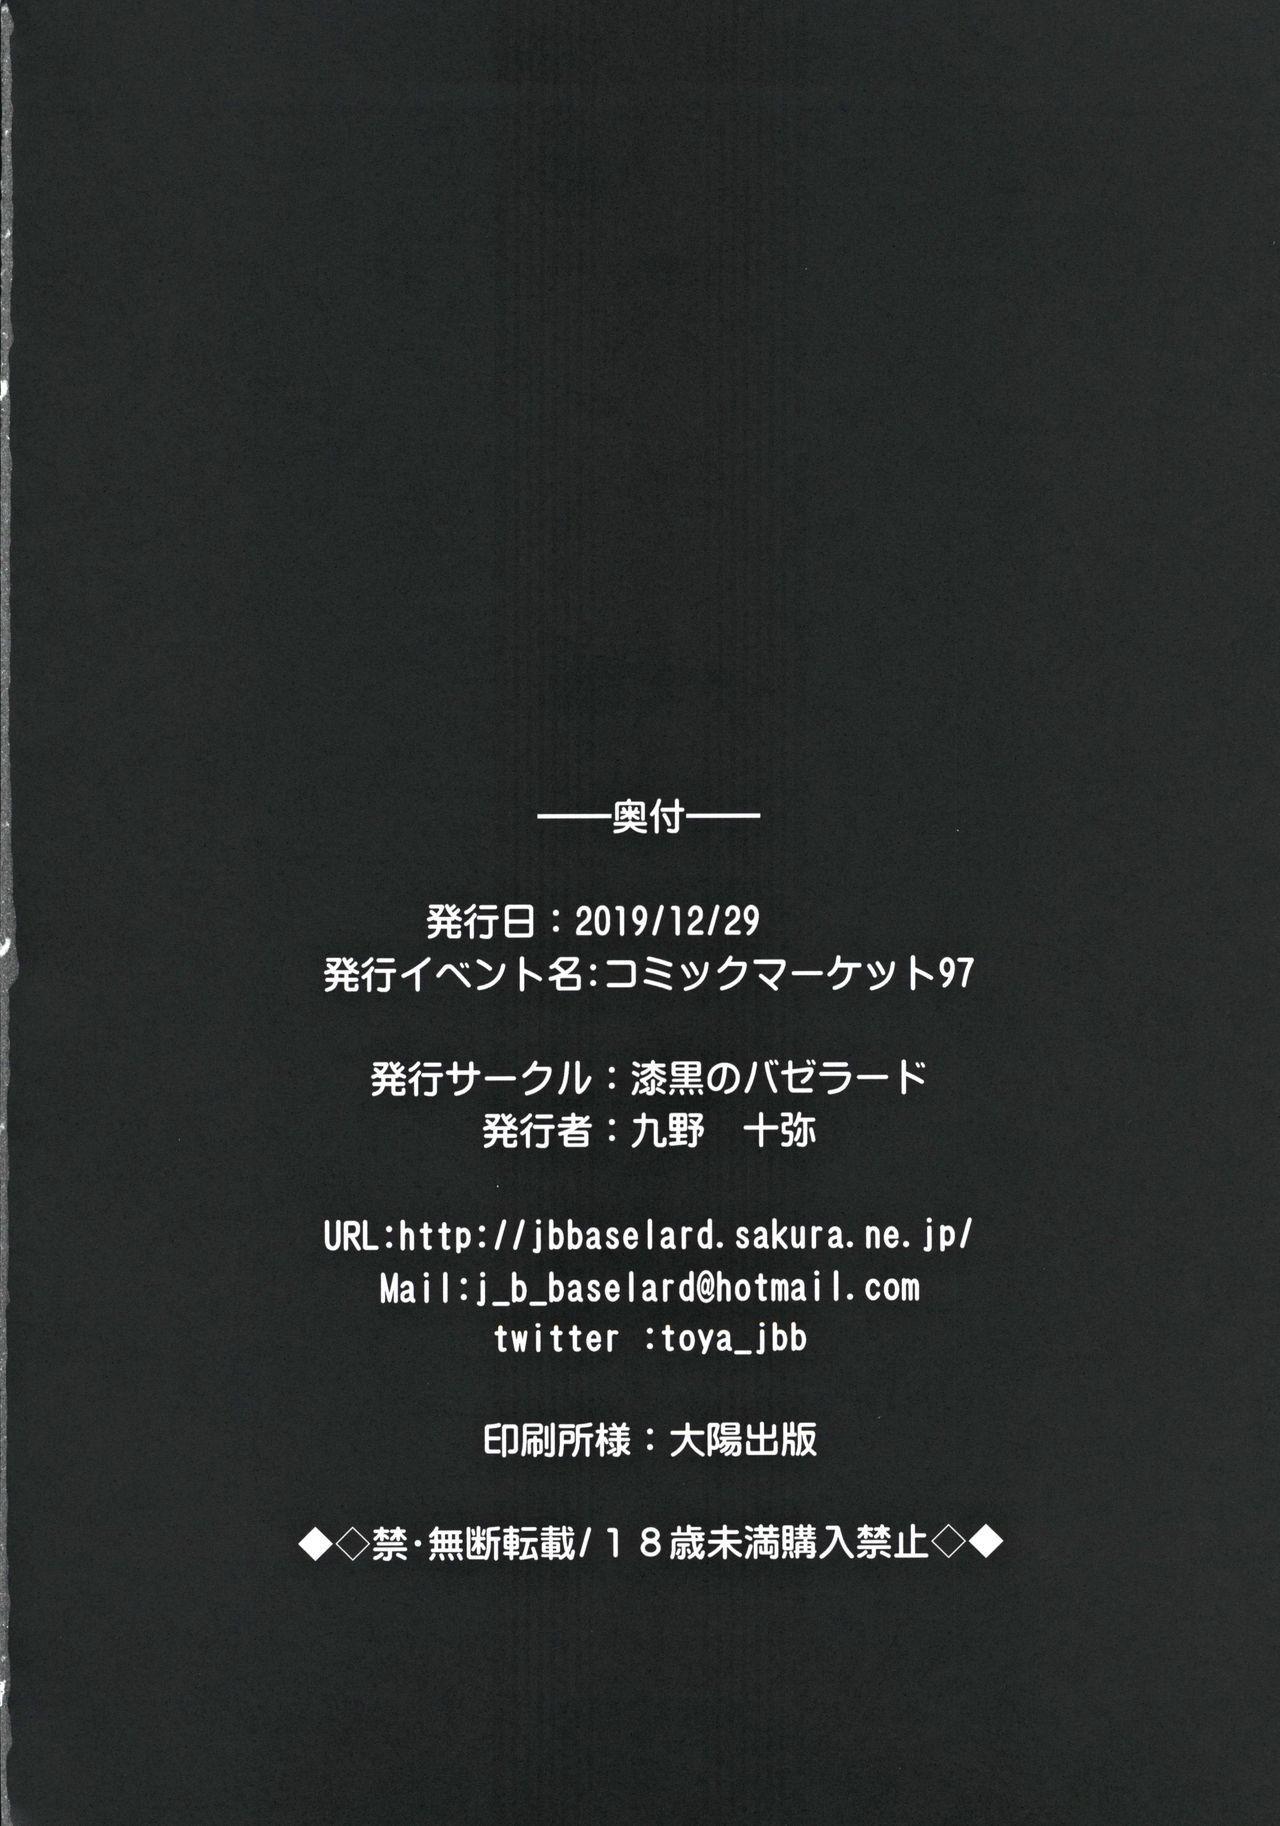 Pendra Shimai no Seijijou   The Pendragon twin sisters' sexual situation 22